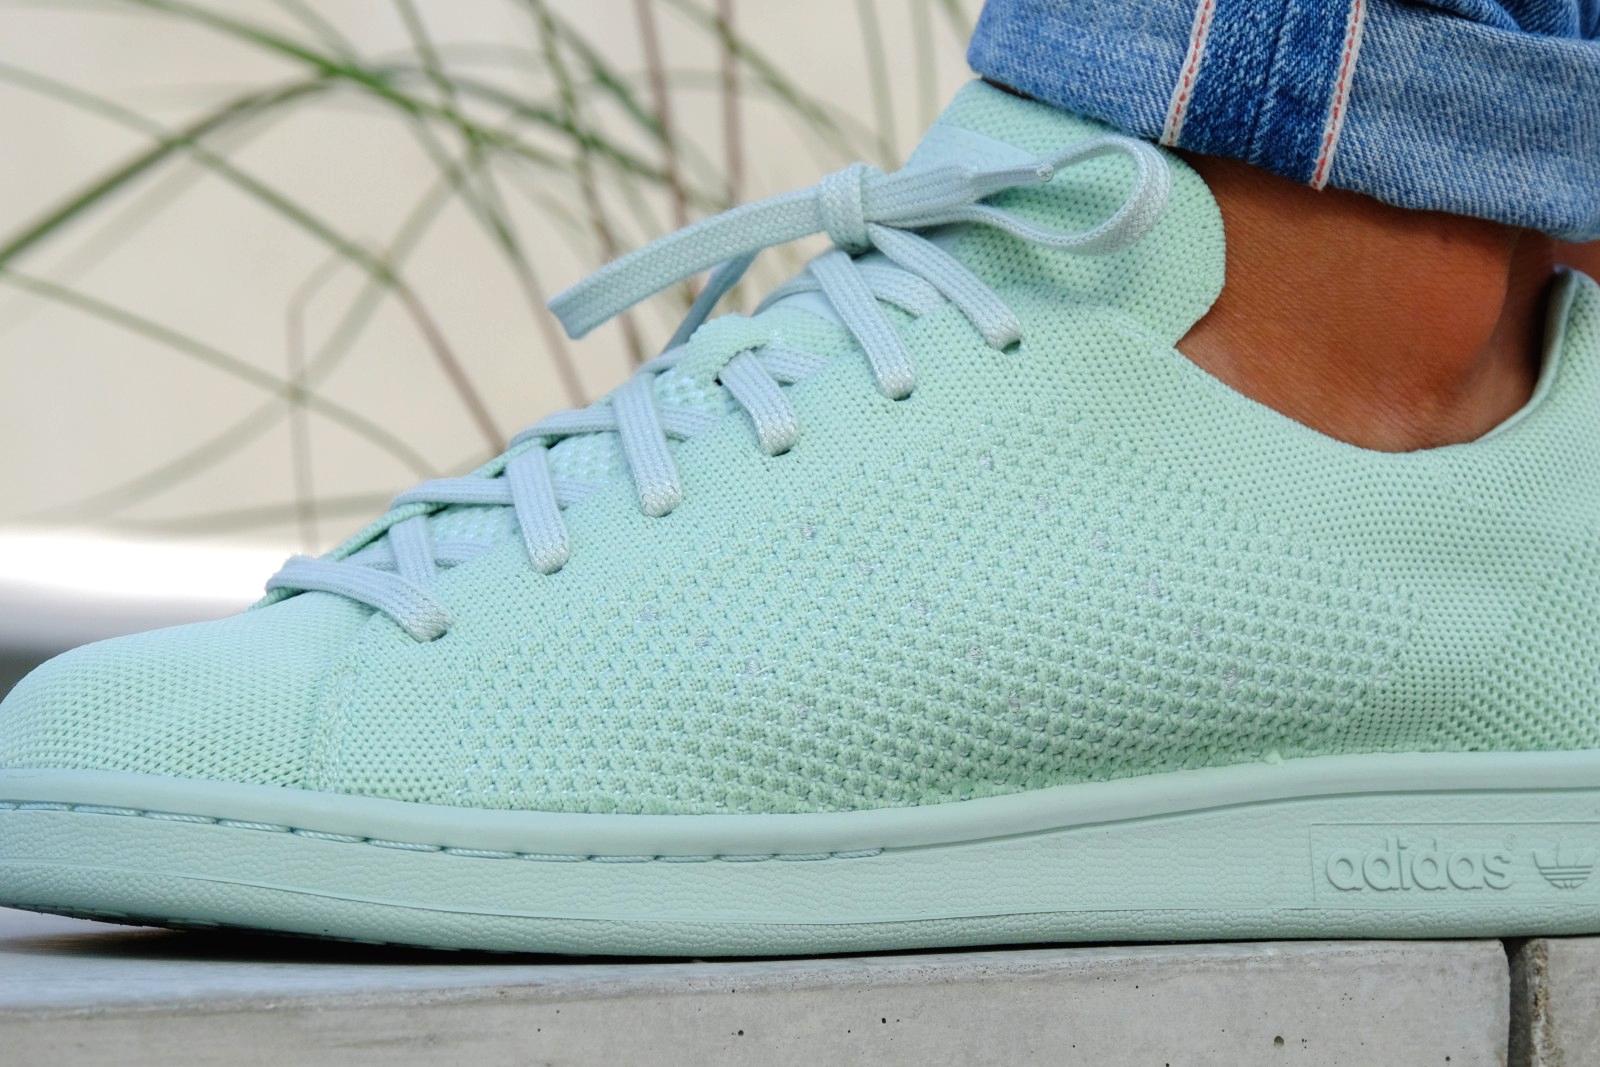 acheter chaussure Adidas Stan Smith PK Primeknit Vapour Green (4)